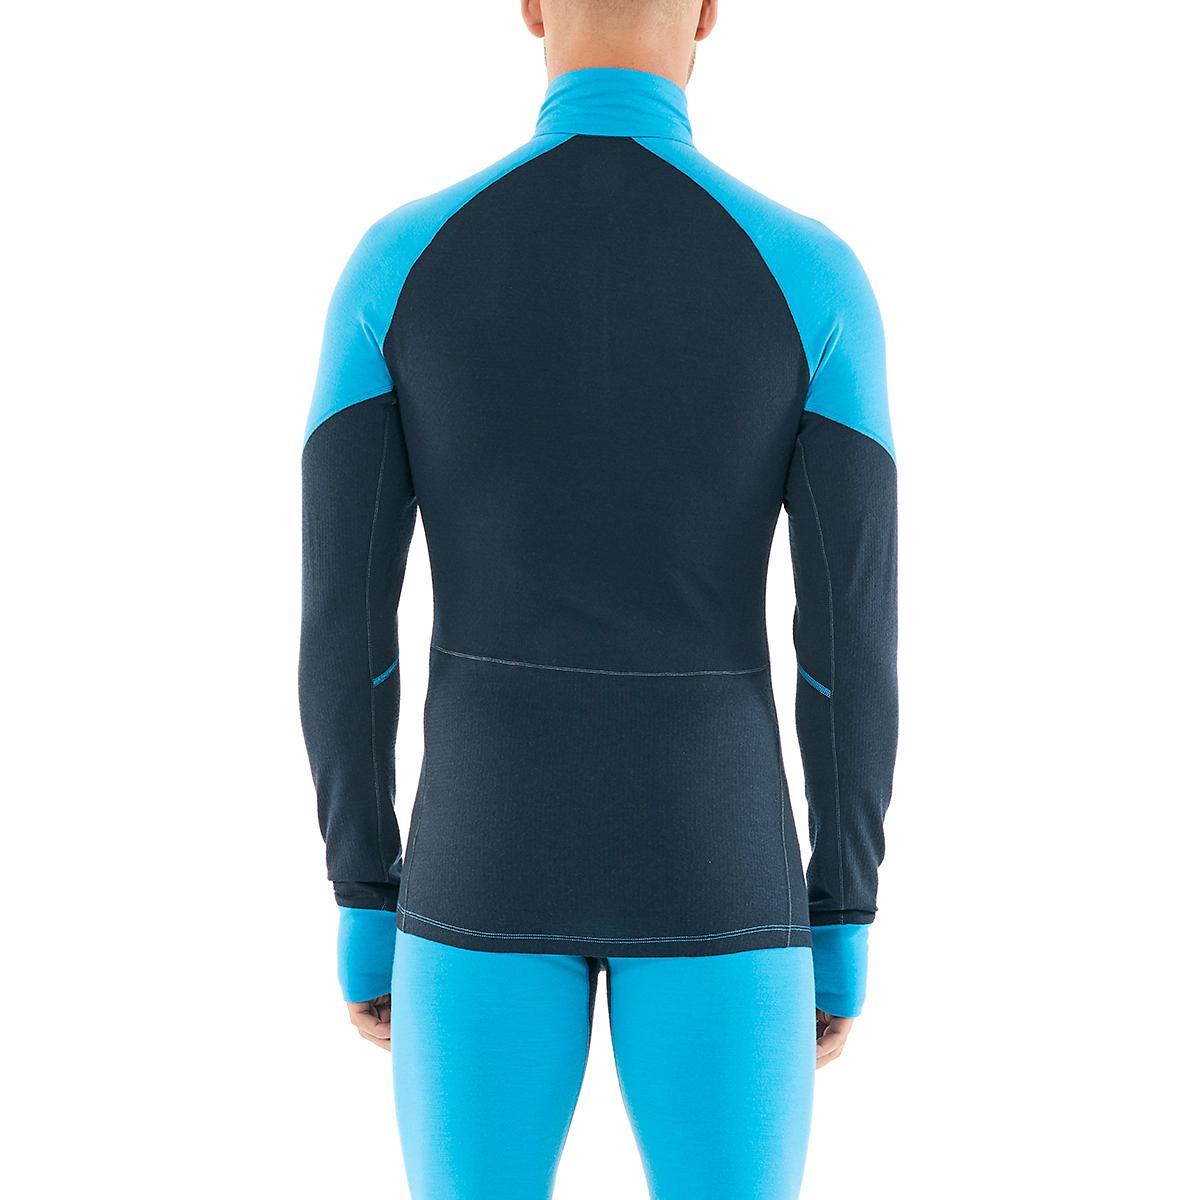 Men's Icebreaker 260 Zone Long Sleeve Half Zip - Color: Polar - Size: S, Polar, large, image 3